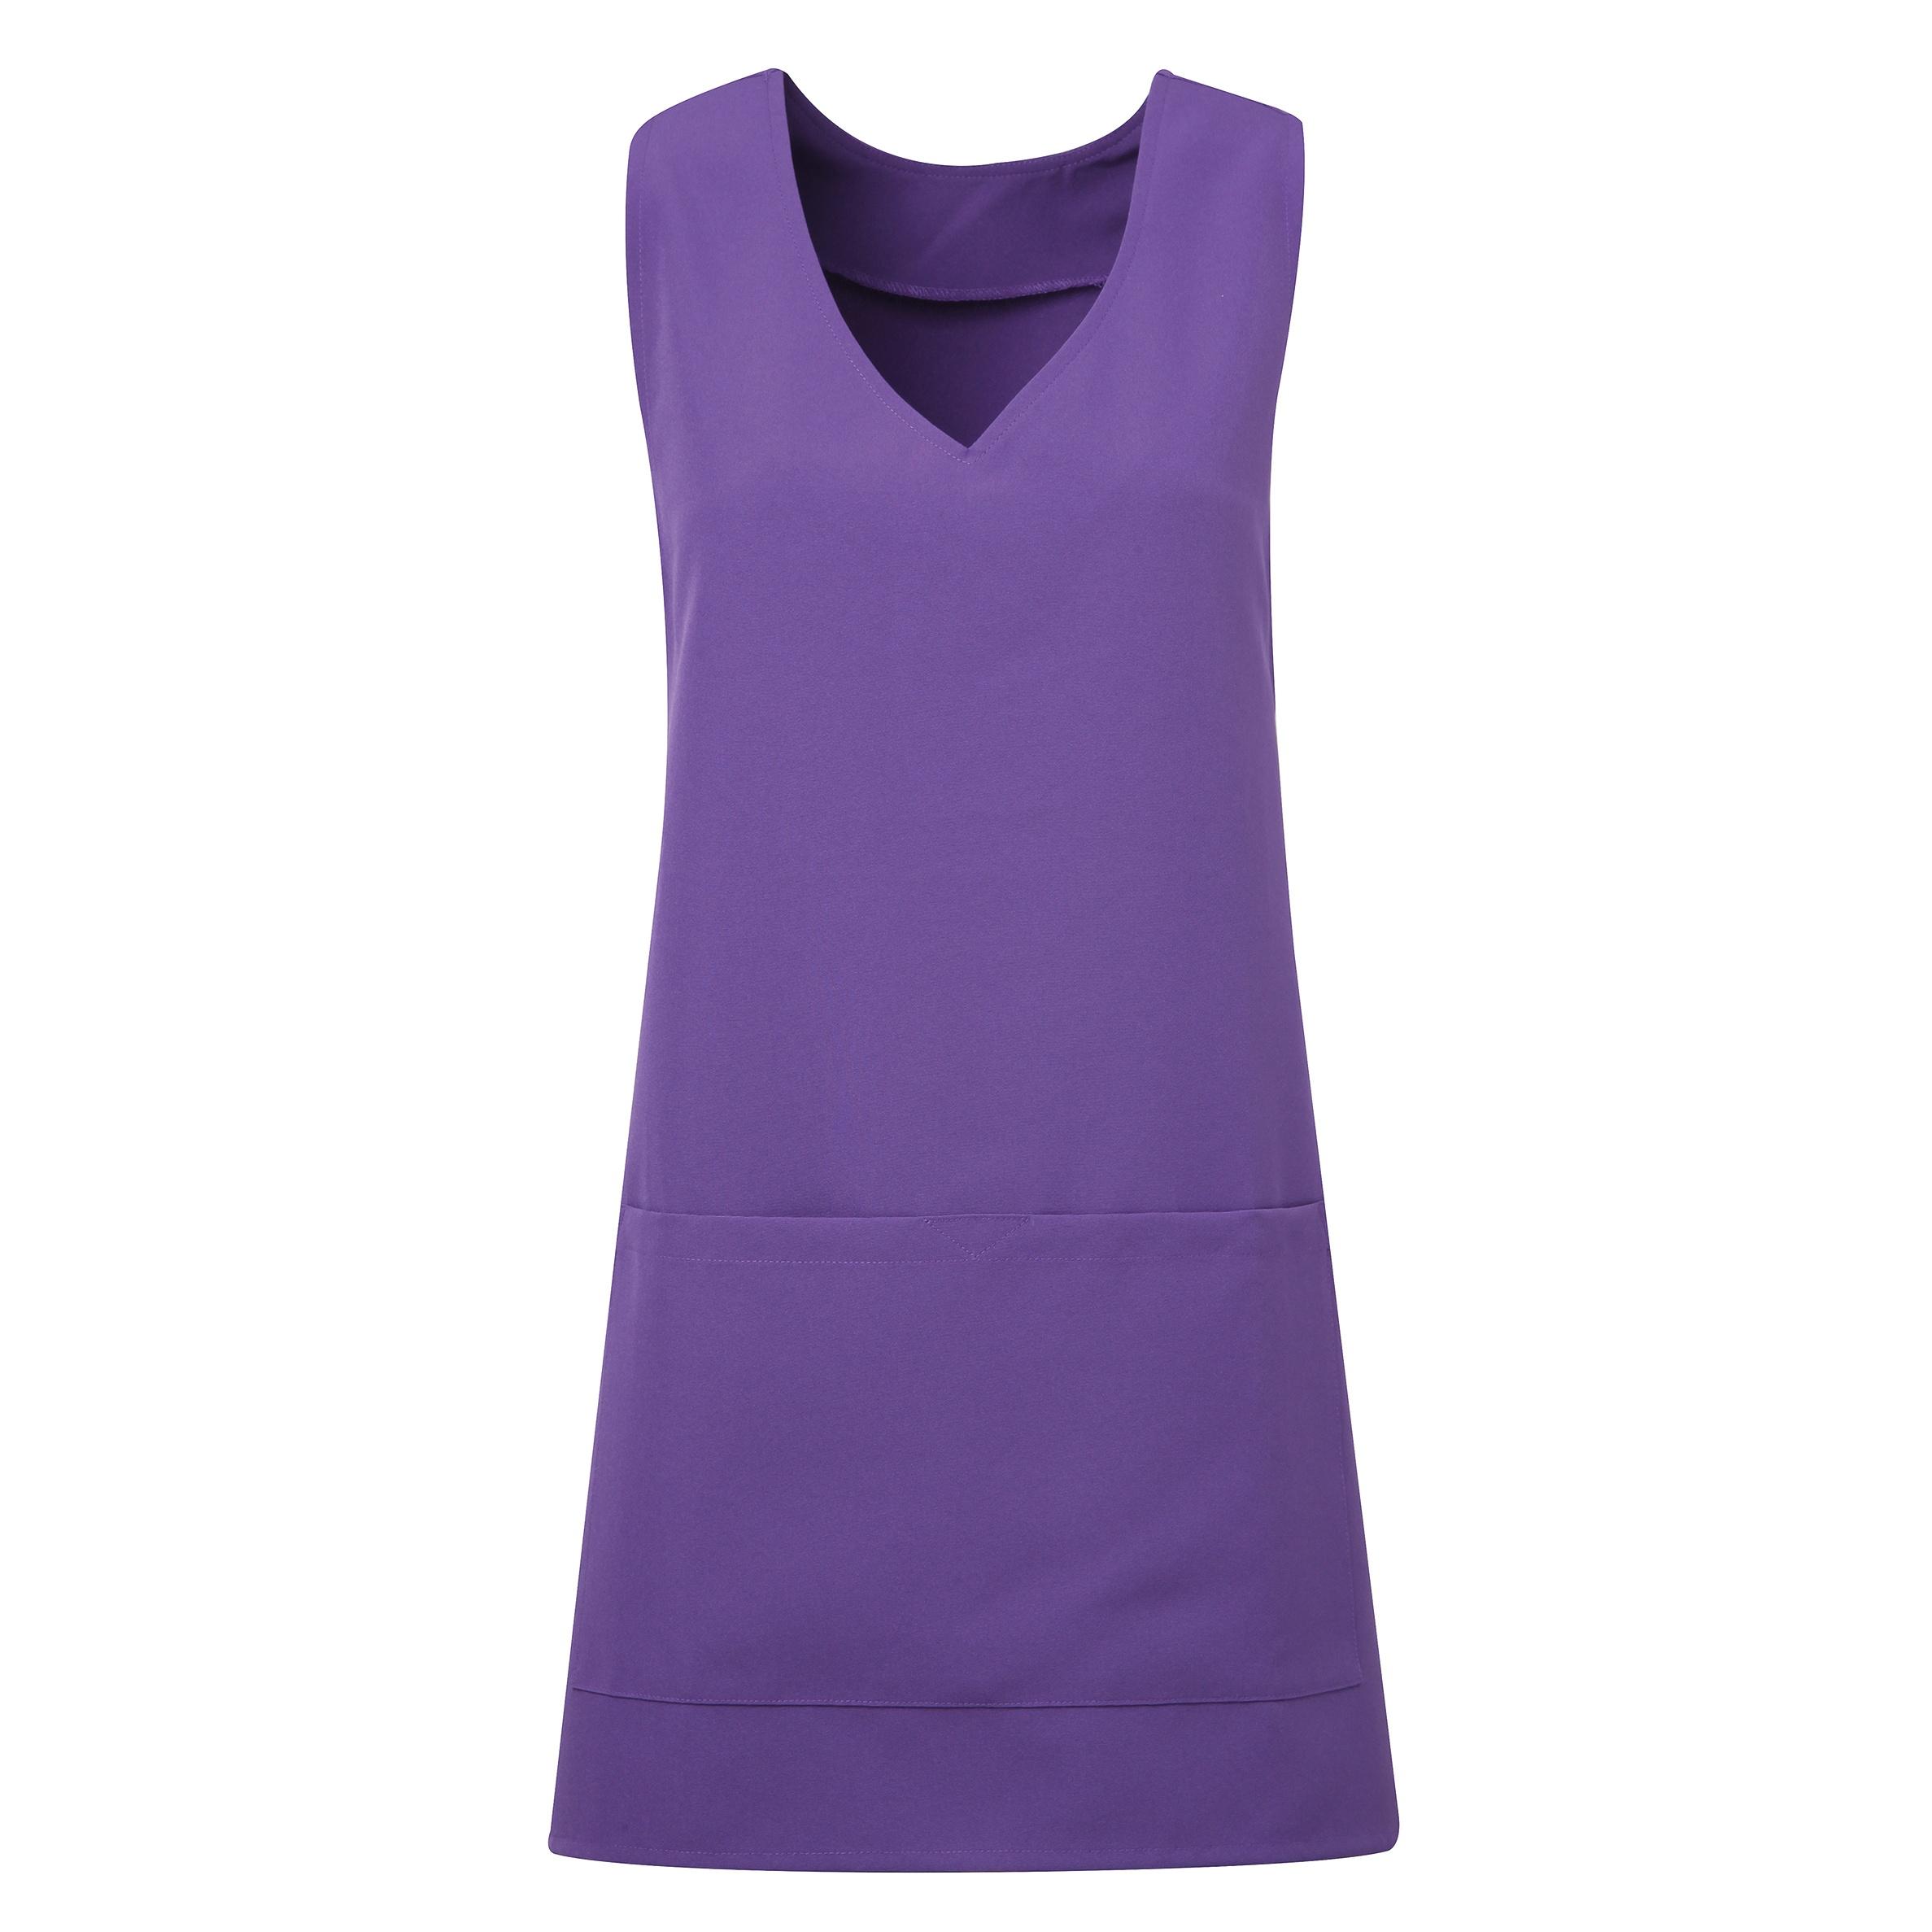 Premier Womens/Ladies Wrap Around Sleeveless Tunic Apron (L/XL) (Purple)